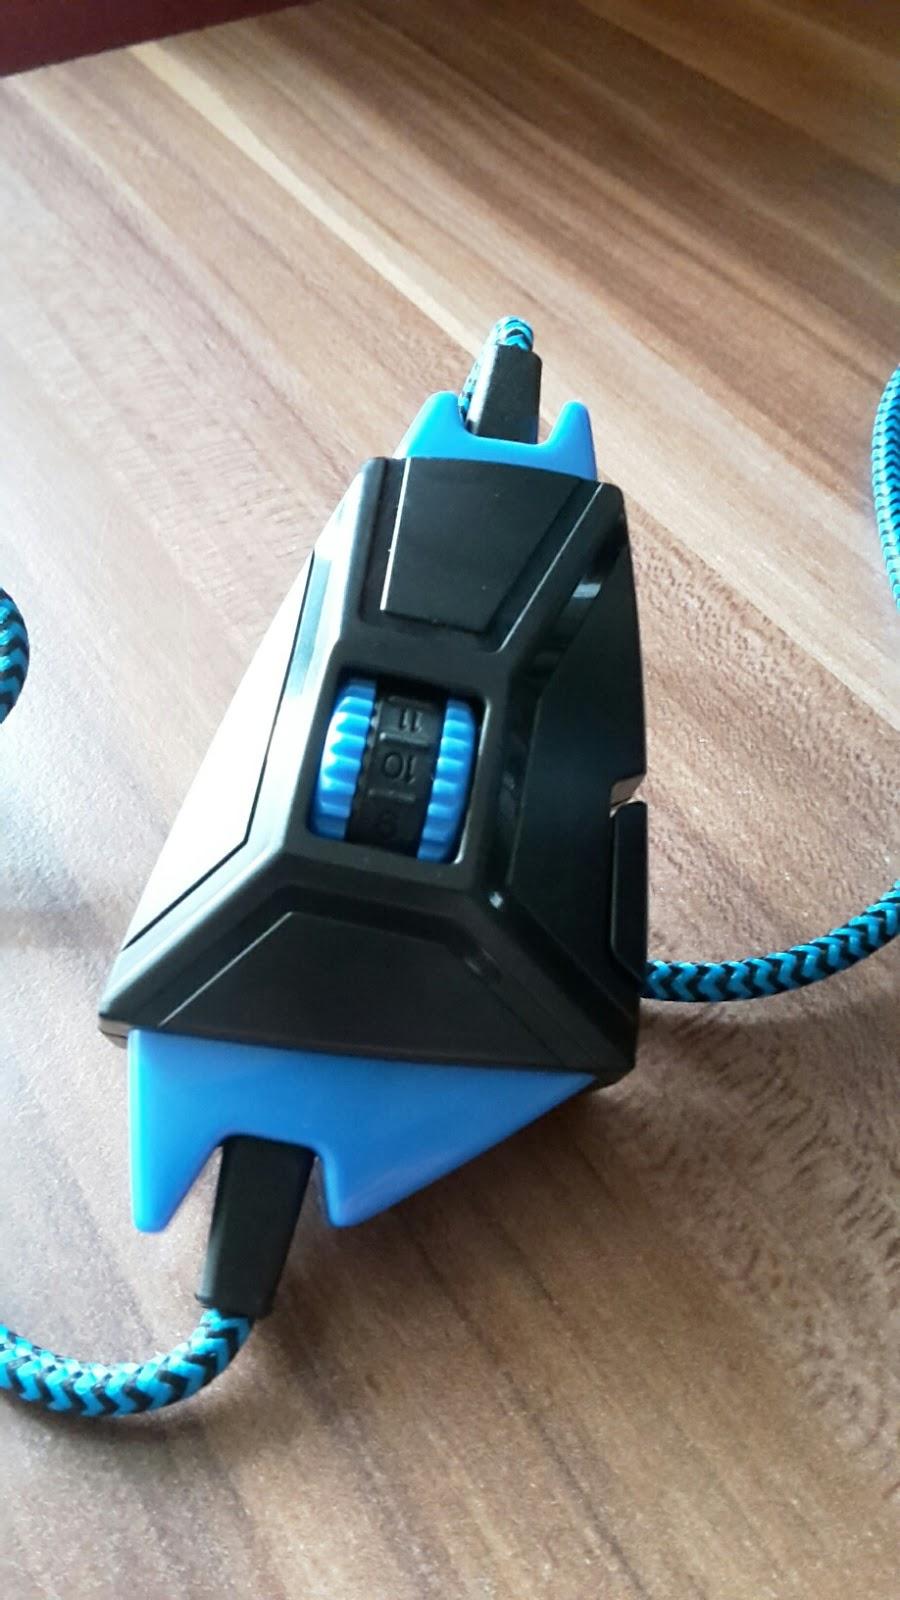 mona 39 s blog kingtop ps4 gaming headset k11 stereo. Black Bedroom Furniture Sets. Home Design Ideas